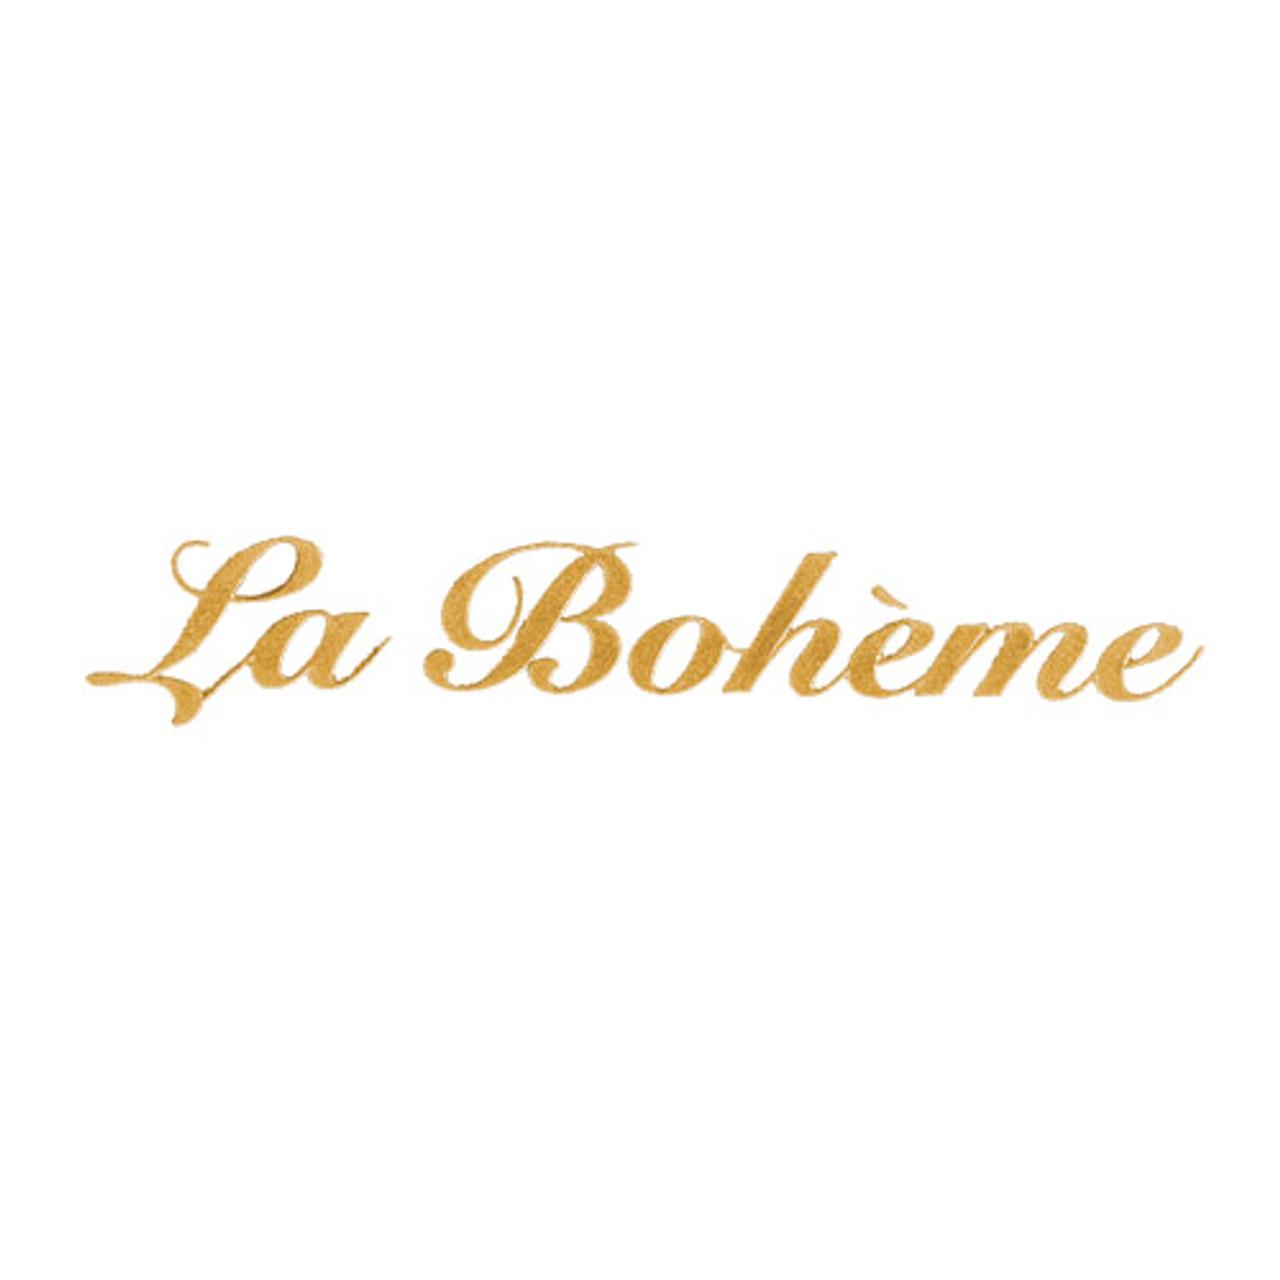 La Boheme Encantador La Scala Cigars - 5.75 x 54 (Box of 18)